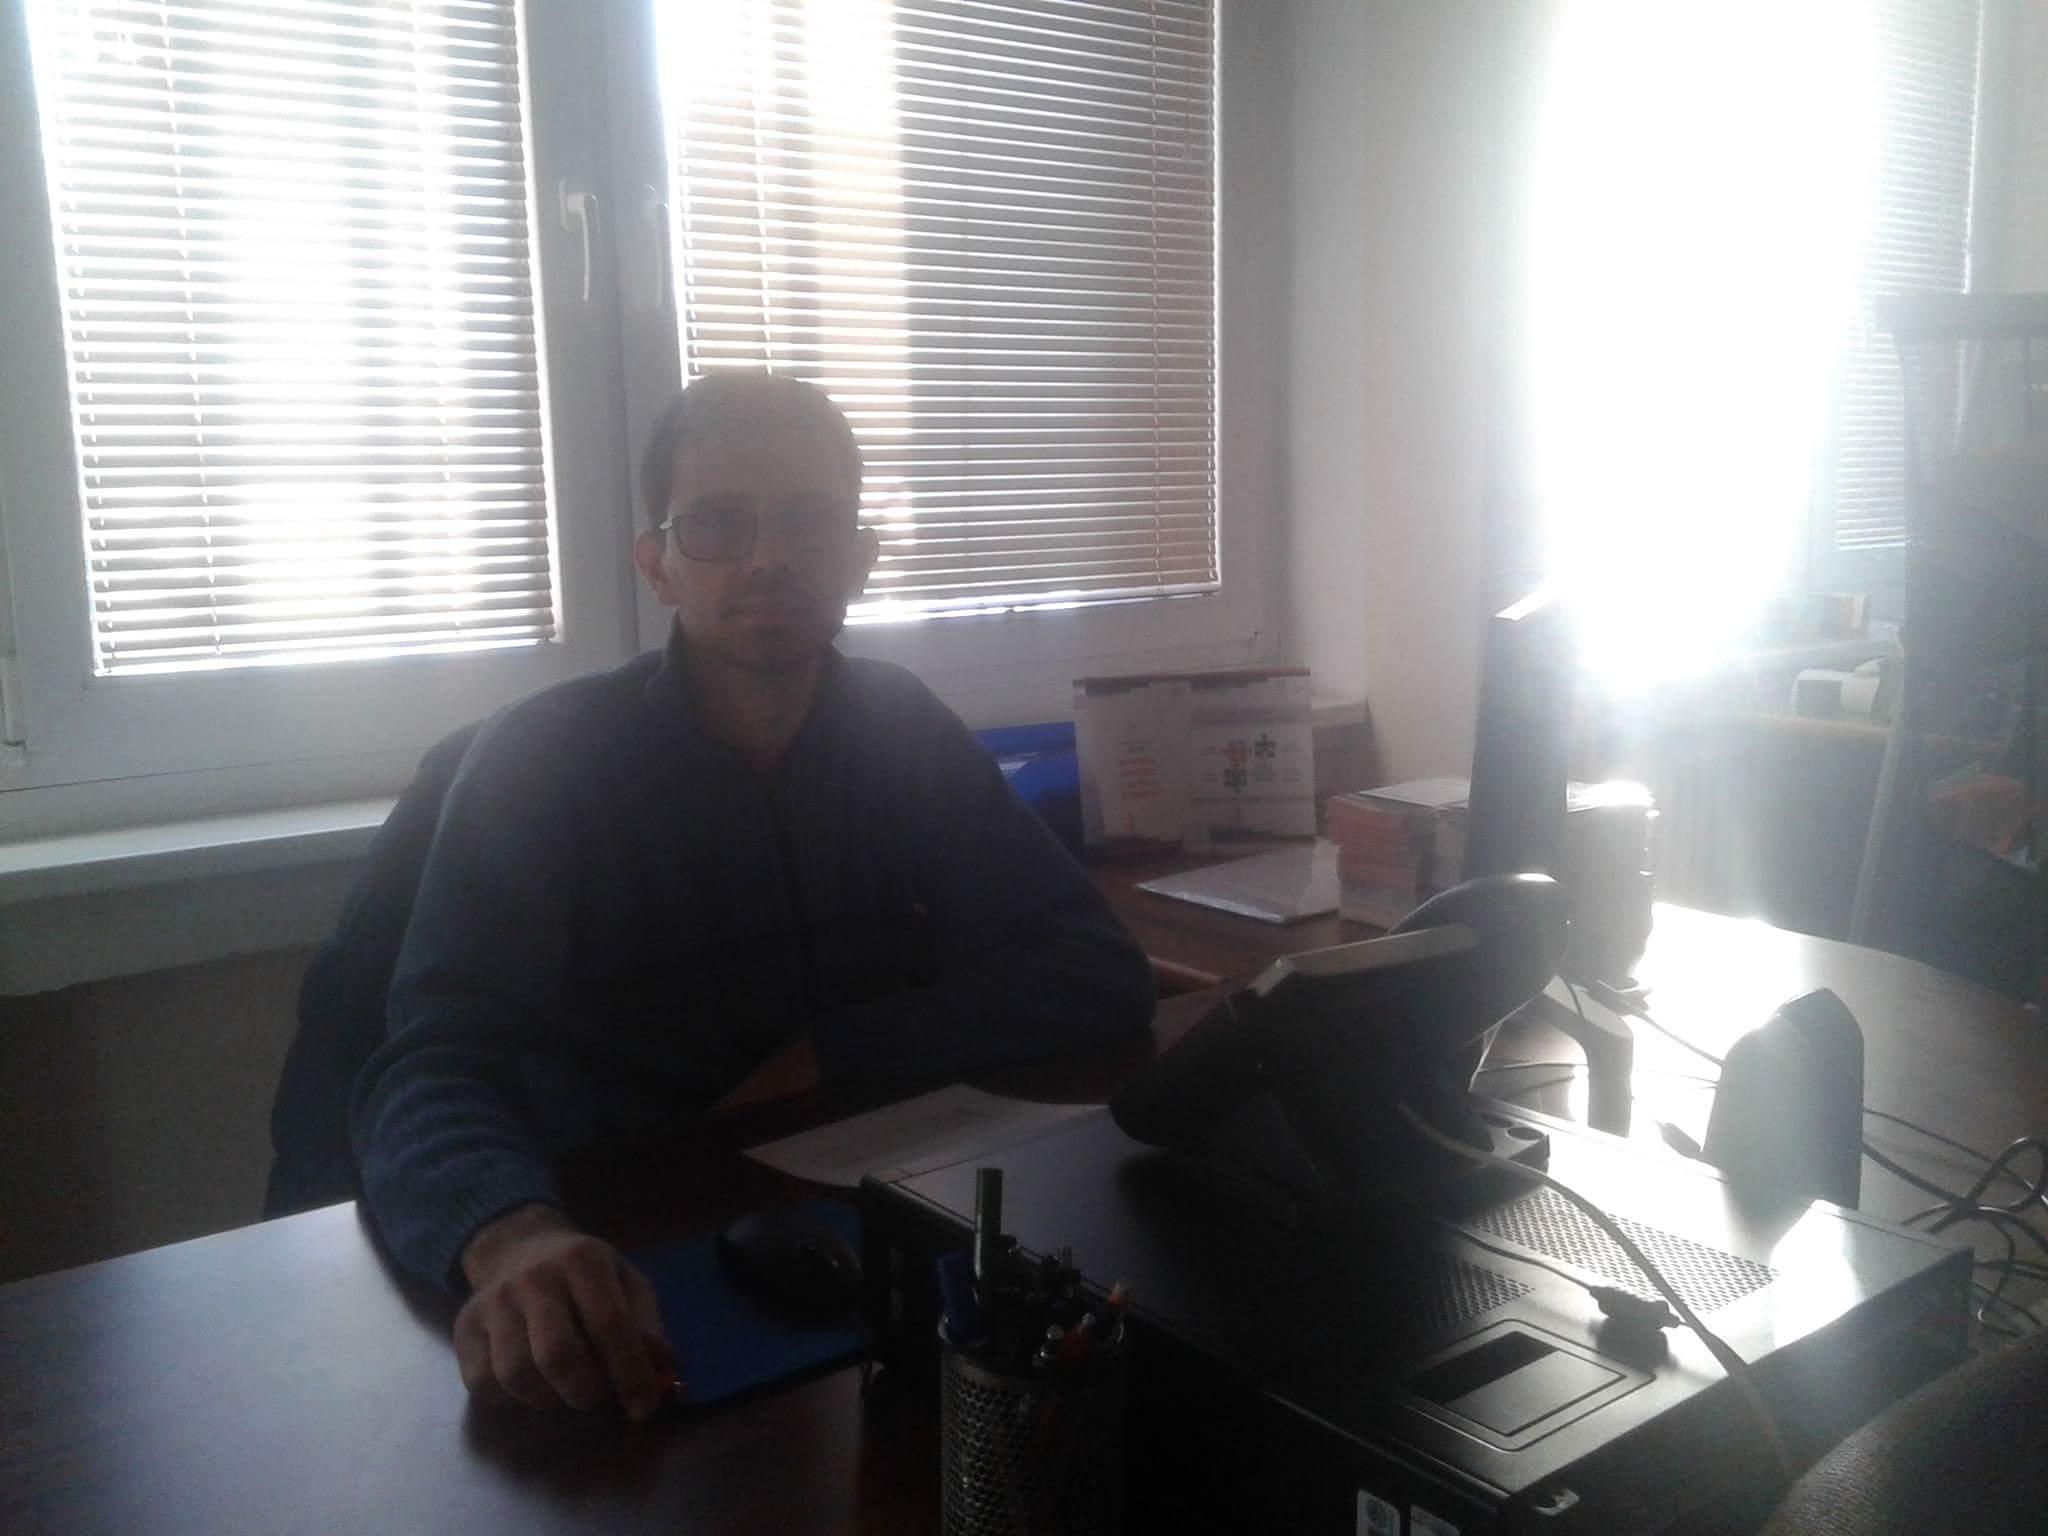 Stefan Savić, mentor studentima sa invaliditetom. Foto: Anđela Zec